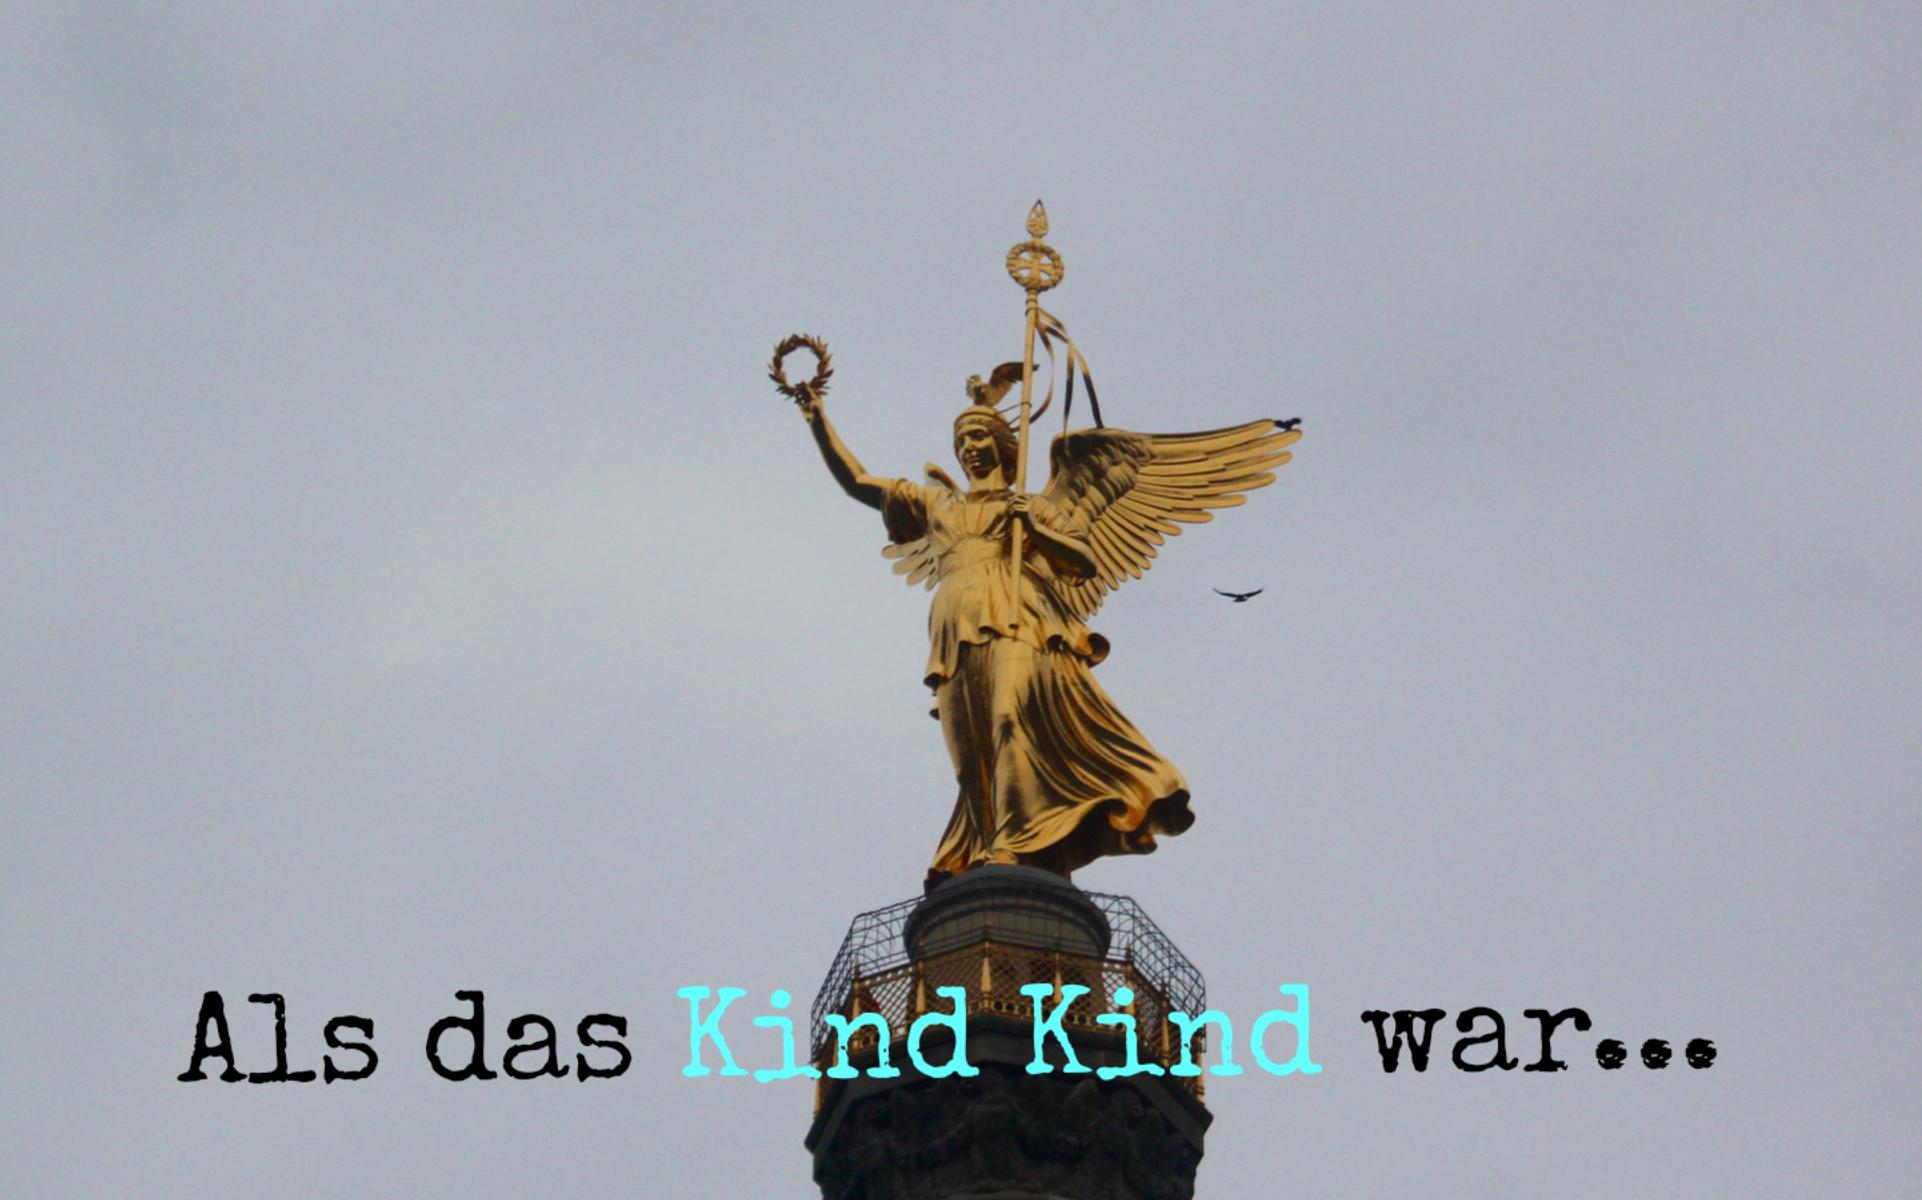 Ensimmäistä kertaa Berliinissä L I L O U's #lilous #berlin #wenders #visitberlin #mitte #charlottenburg #tegel #Siegessäule #brandenburggate #alexanderplatz